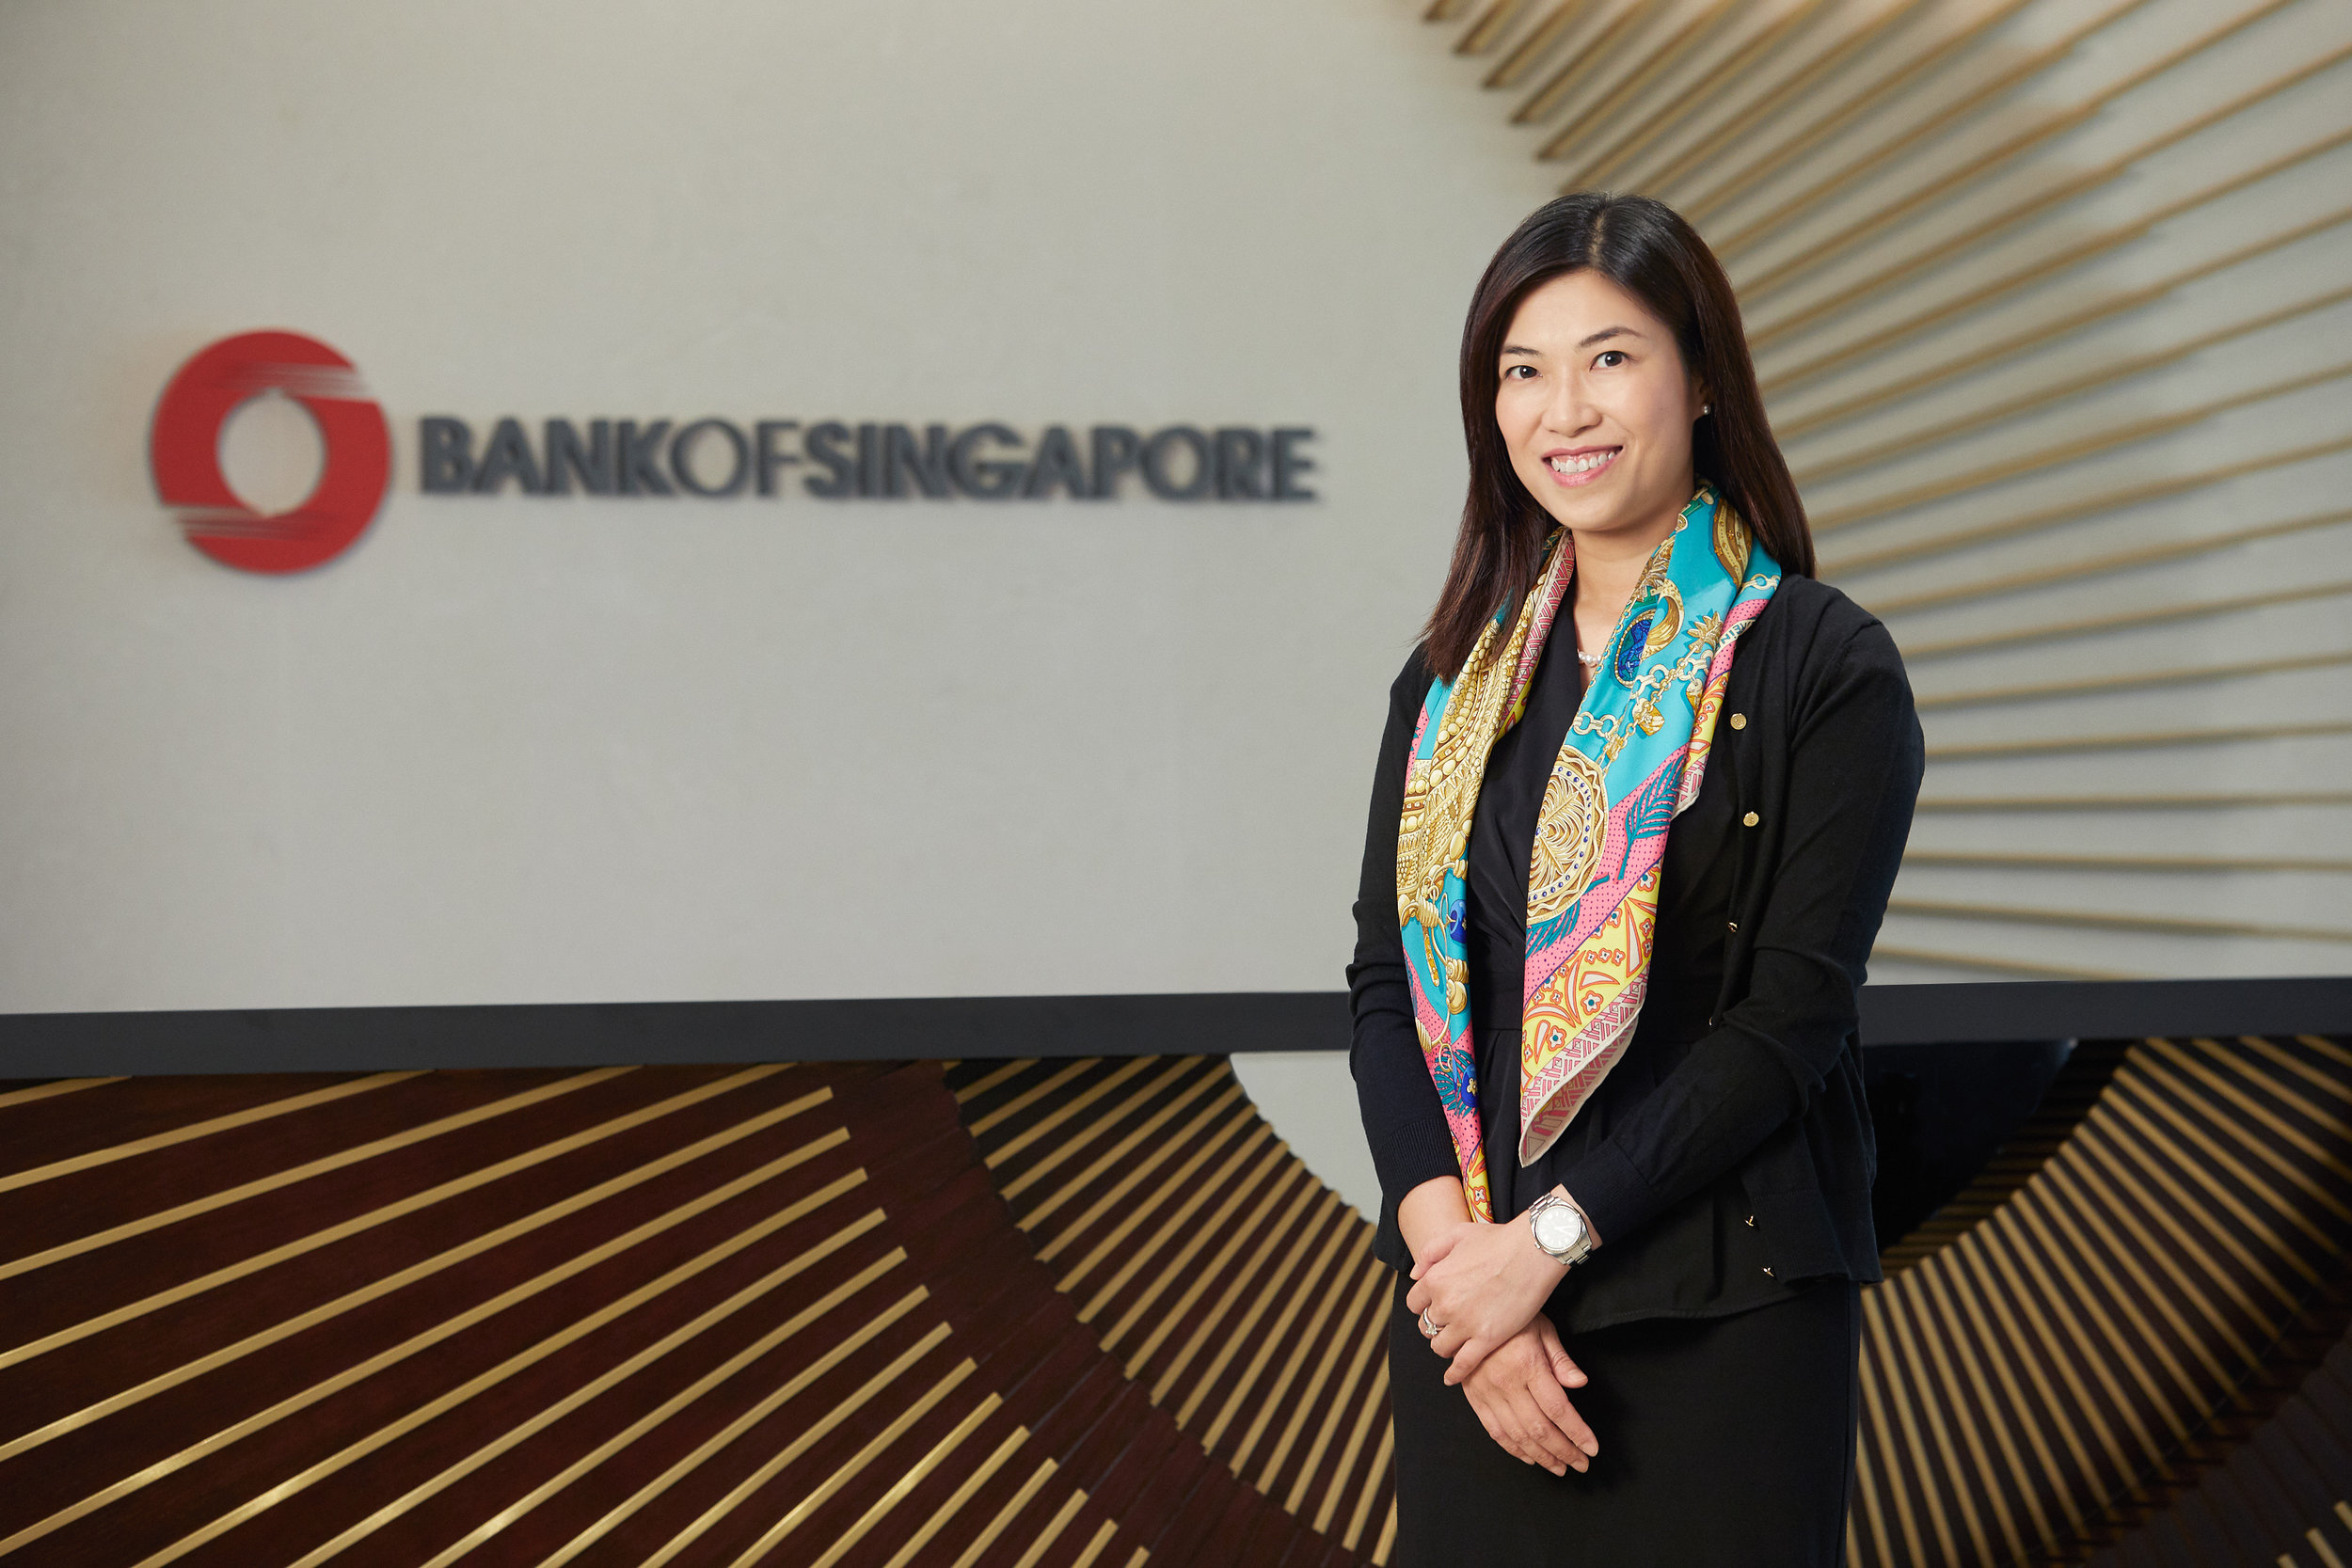 Bank-of-singapore_Potrait_Michael CW Chiu_8.jpg